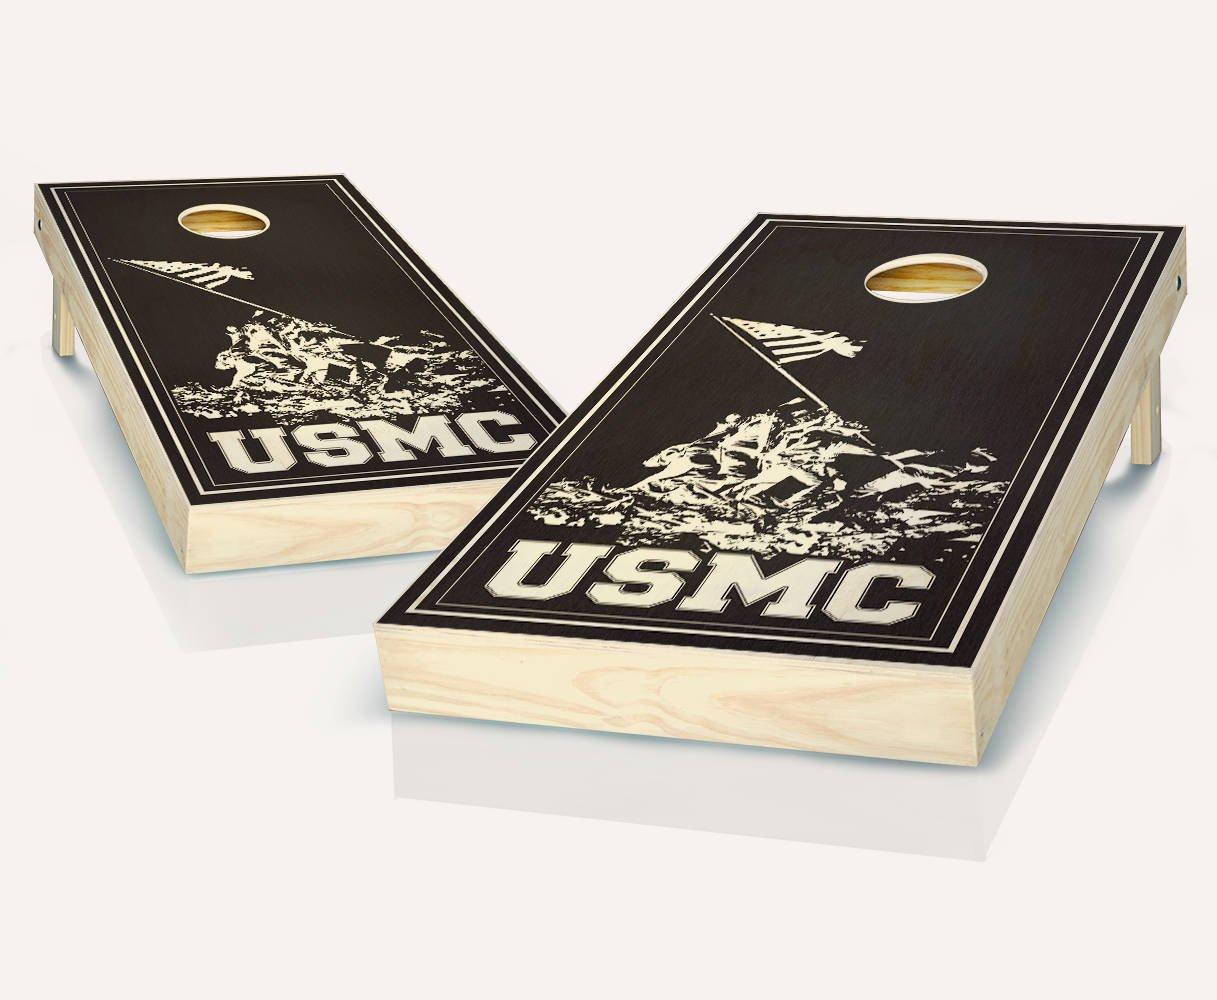 USMC海兵隊MilitaryエボニーStainedカスタムCornholeボードregulation sizeゲームセットBaggo Bags ACA 8 Bean Bag Toss + 8 ACA Regulation Bags B07BWWWRD3, 常呂郡:538ee4a0 --- webshop.mrf.se